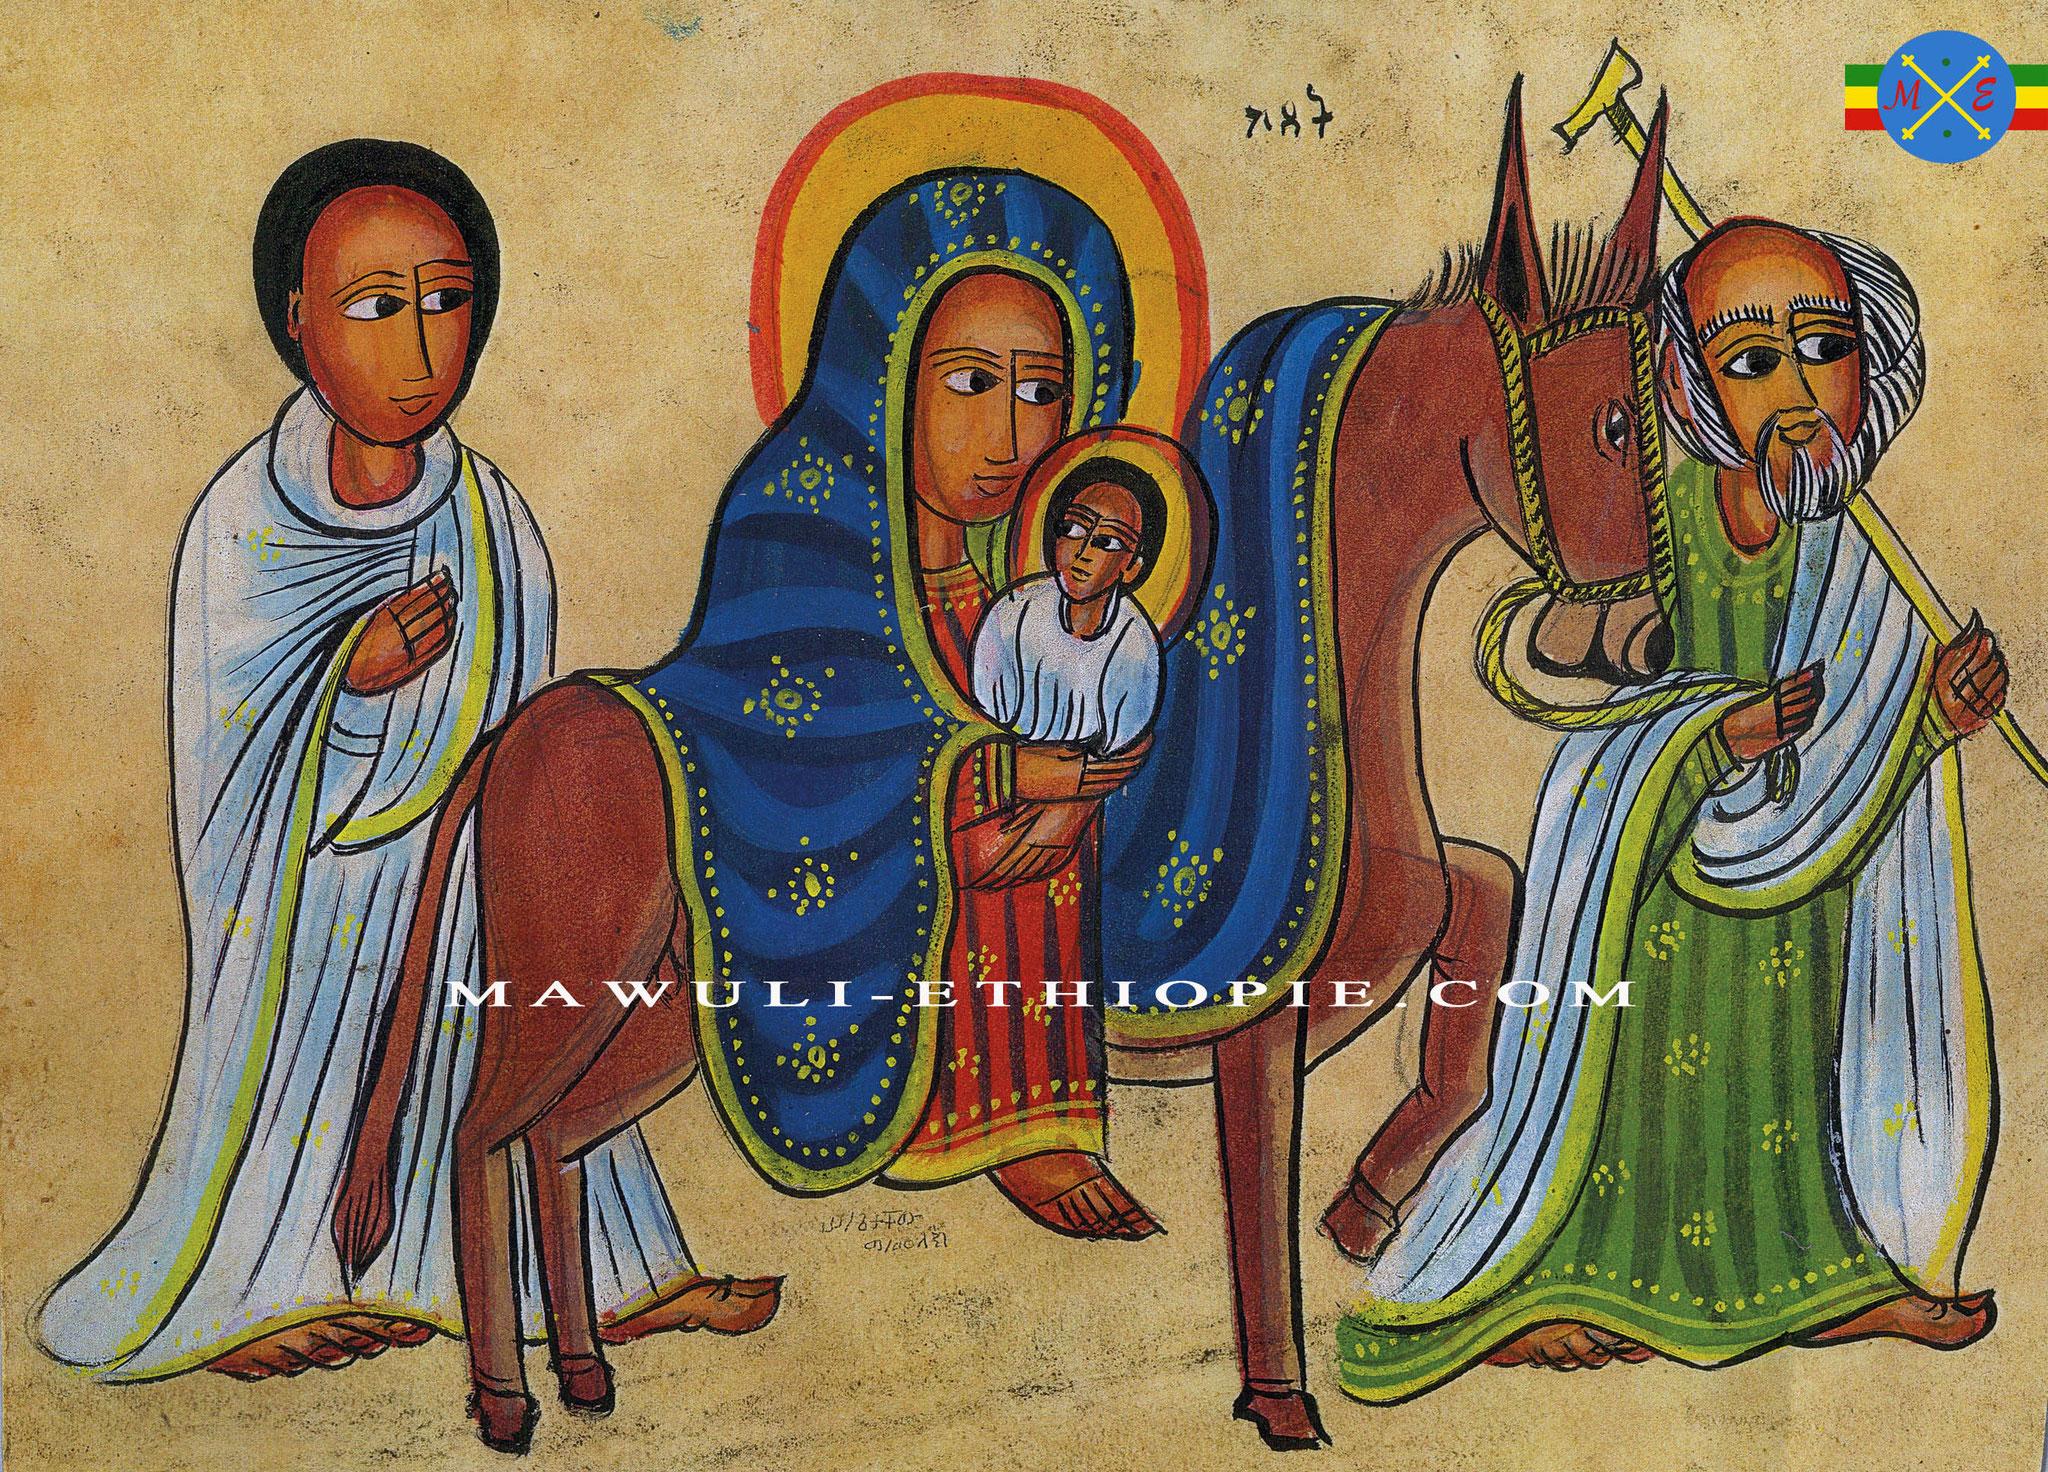 Grand choix Icone éthiopienne Tshirt Rasta Haile Selassie Ras Tafari coton Café ethiopie made in Ethiopia Ethiopie Epices éthiopiennes Moringa Bio Ethiopie made by locals solidaire équitable artisanat textils voyage Ethiopie